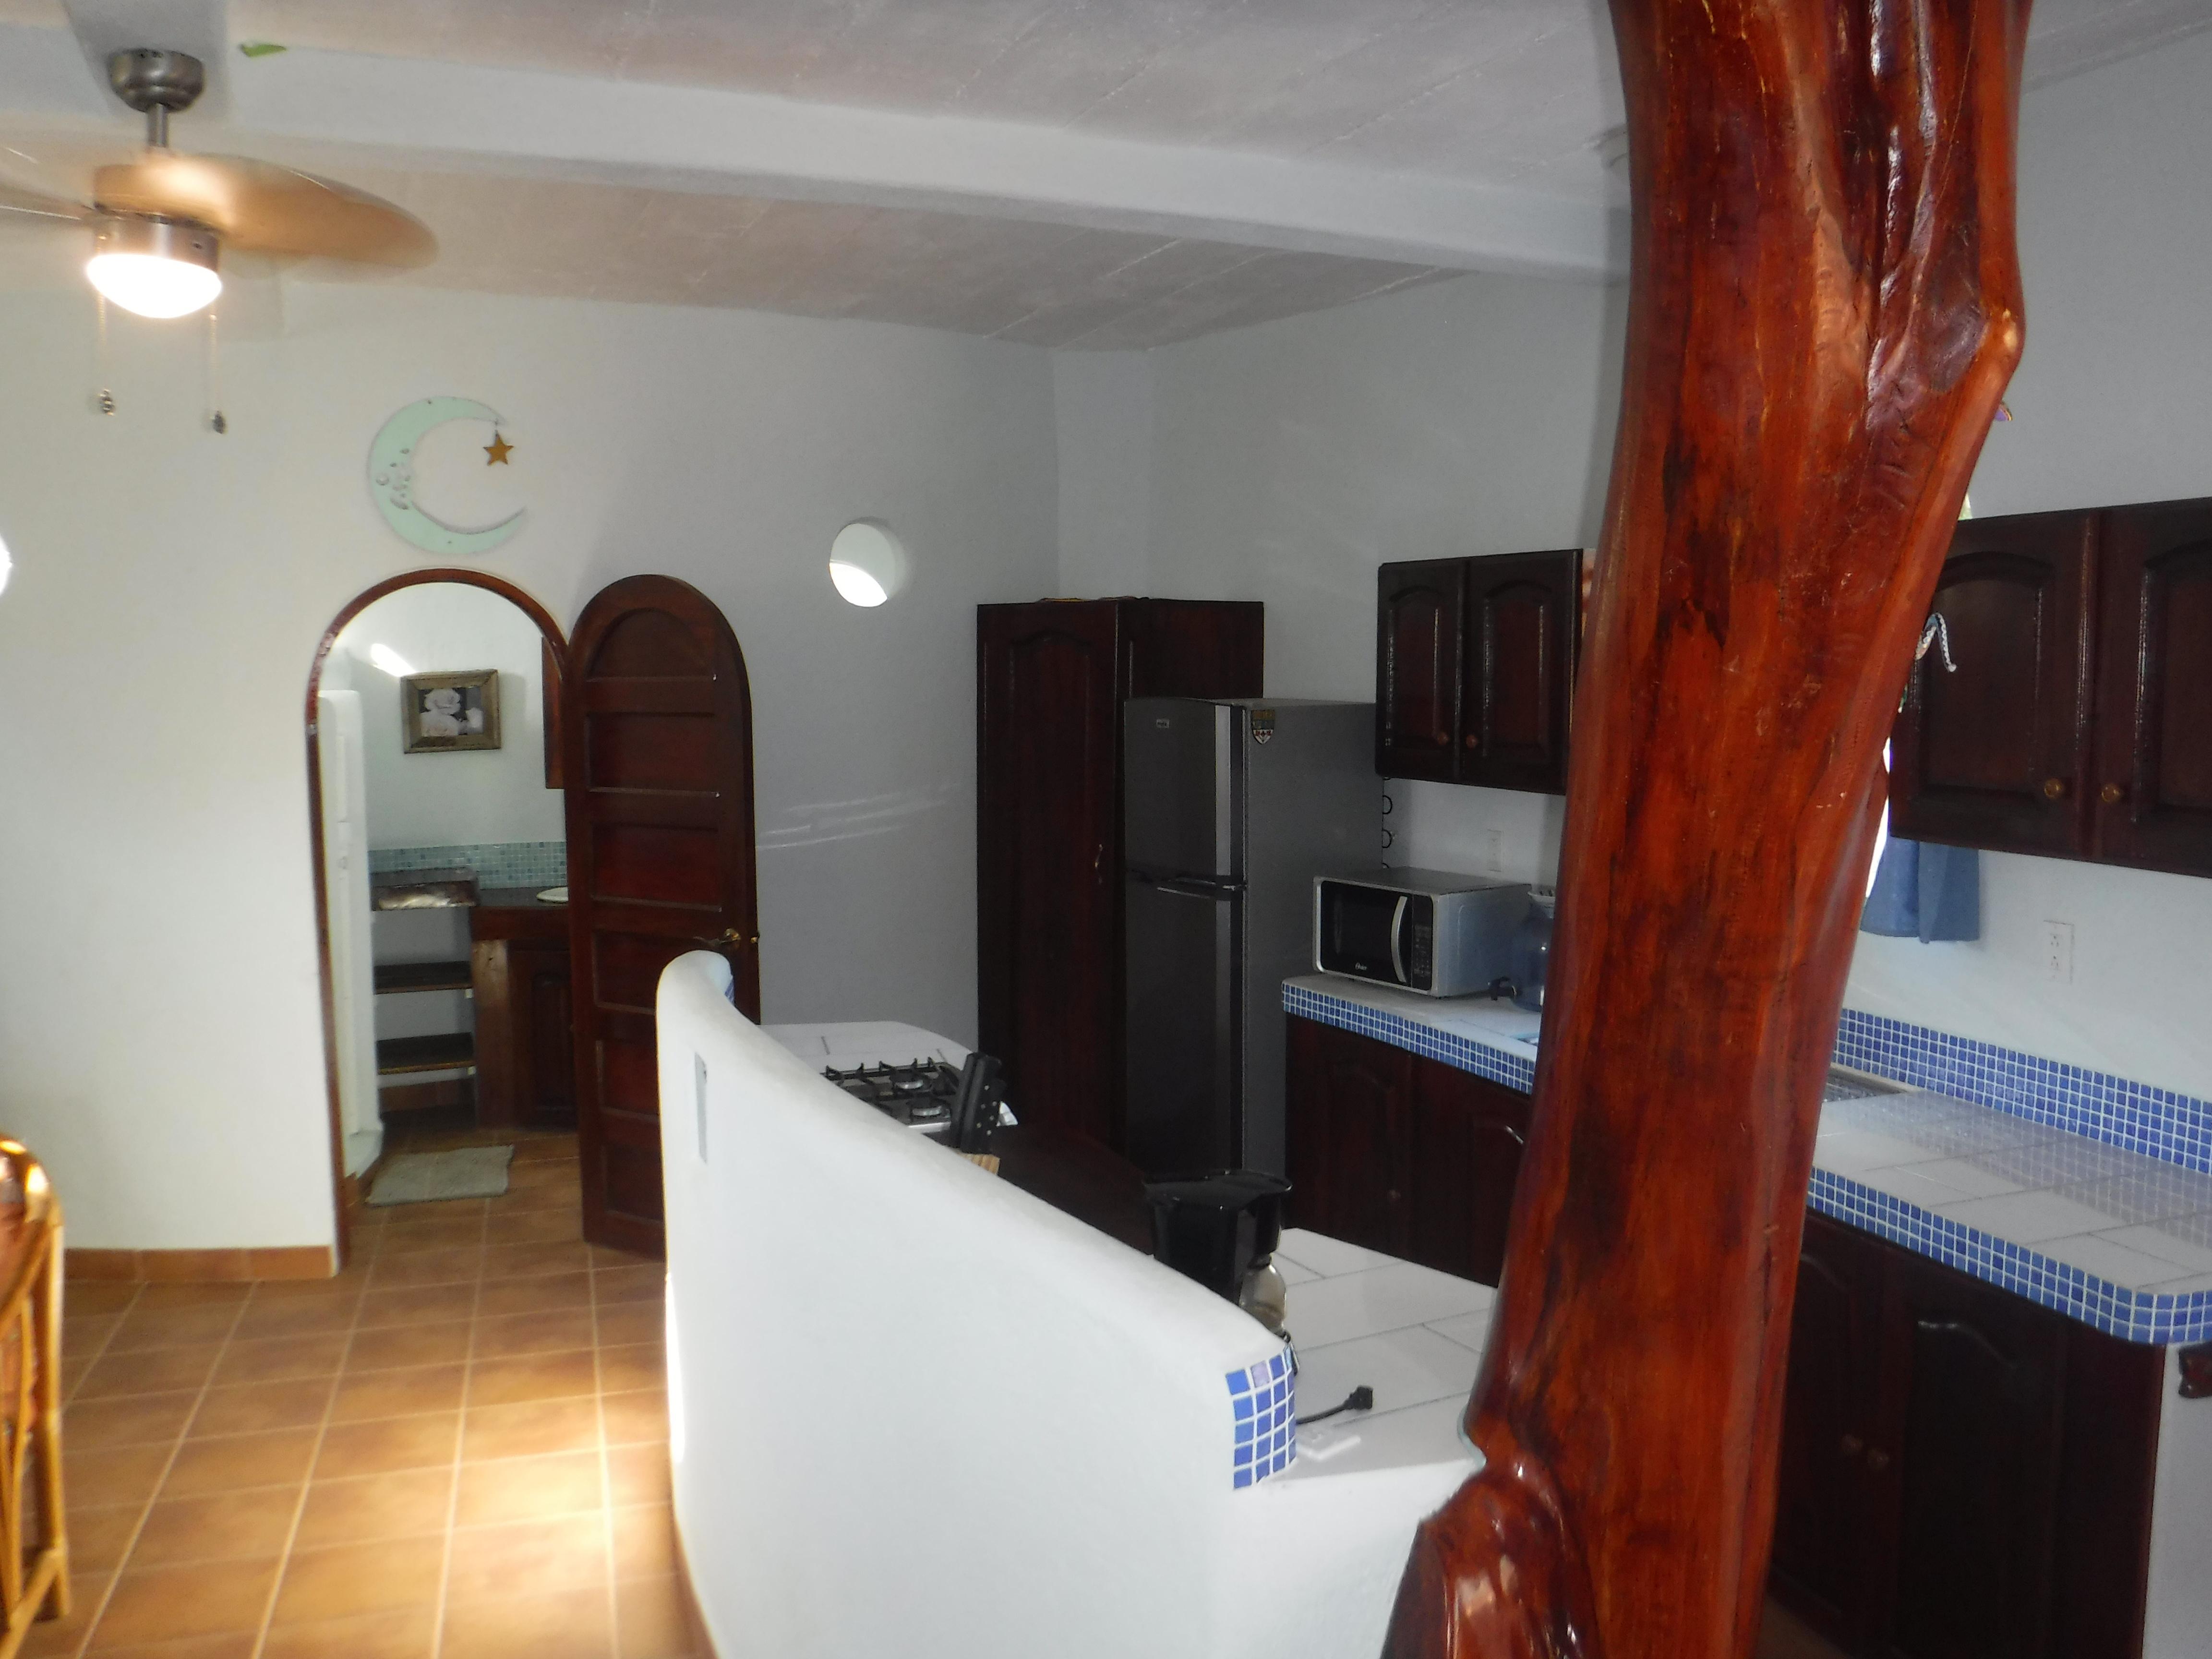 Prado Hills Update and OBrien Delicias Casa 085